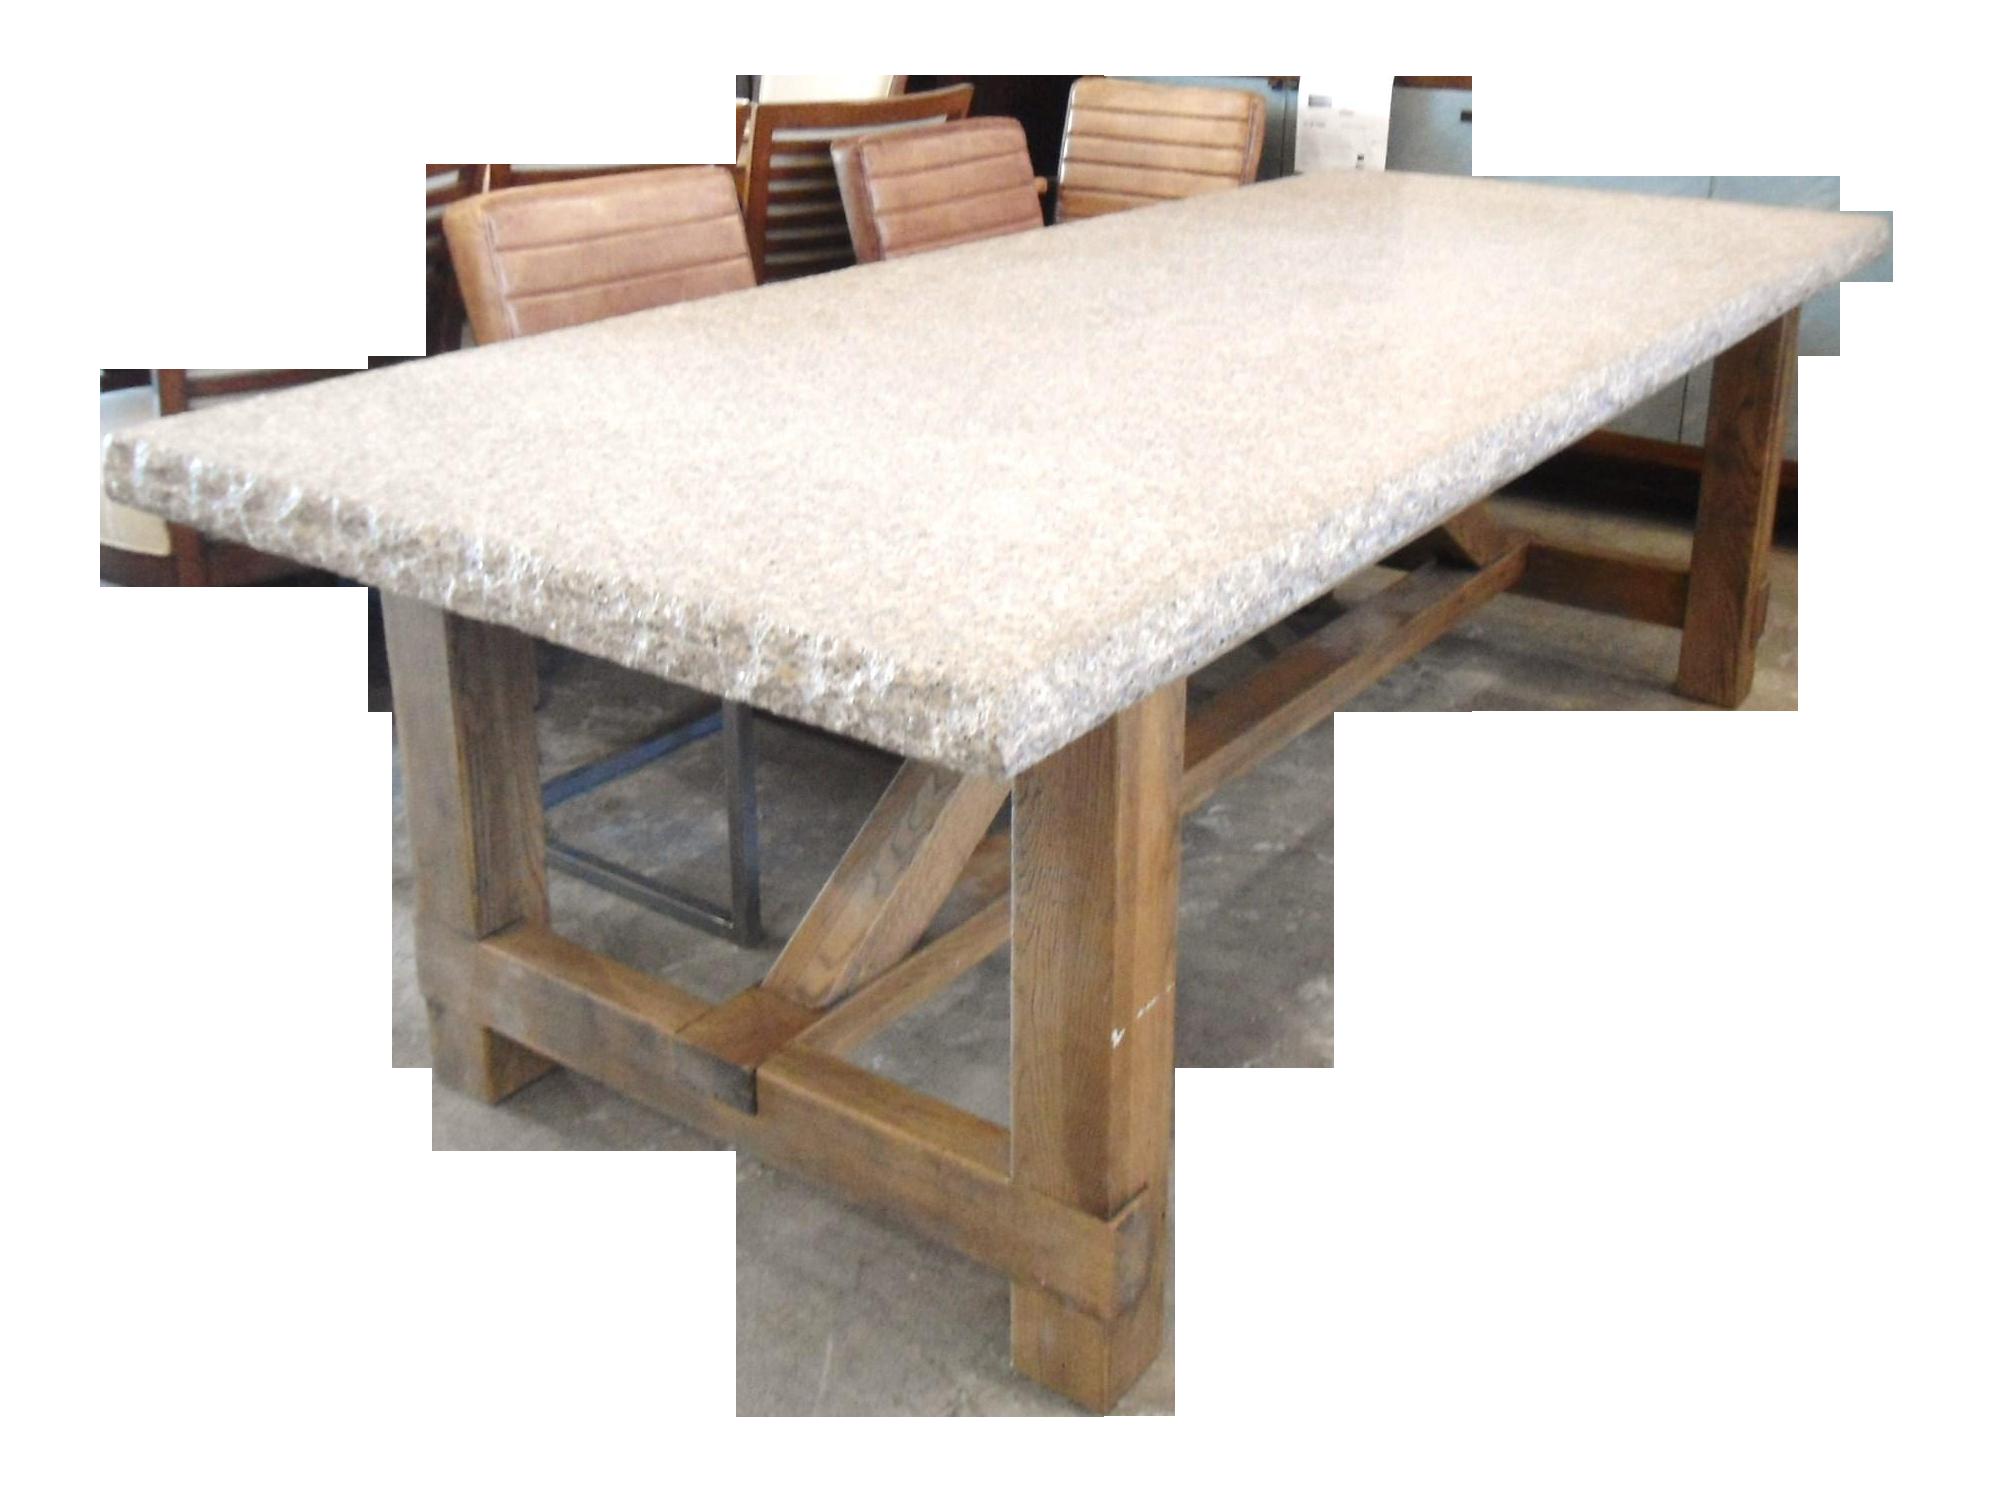 Granite Top Dining Table with Raw Wood Base Chairish : 33cc8c76 6c0b 43ce b3e4 e520b599c1ceaspectfitampwidth640ampheight640 from www.chairish.com size 640 x 640 jpeg 30kB